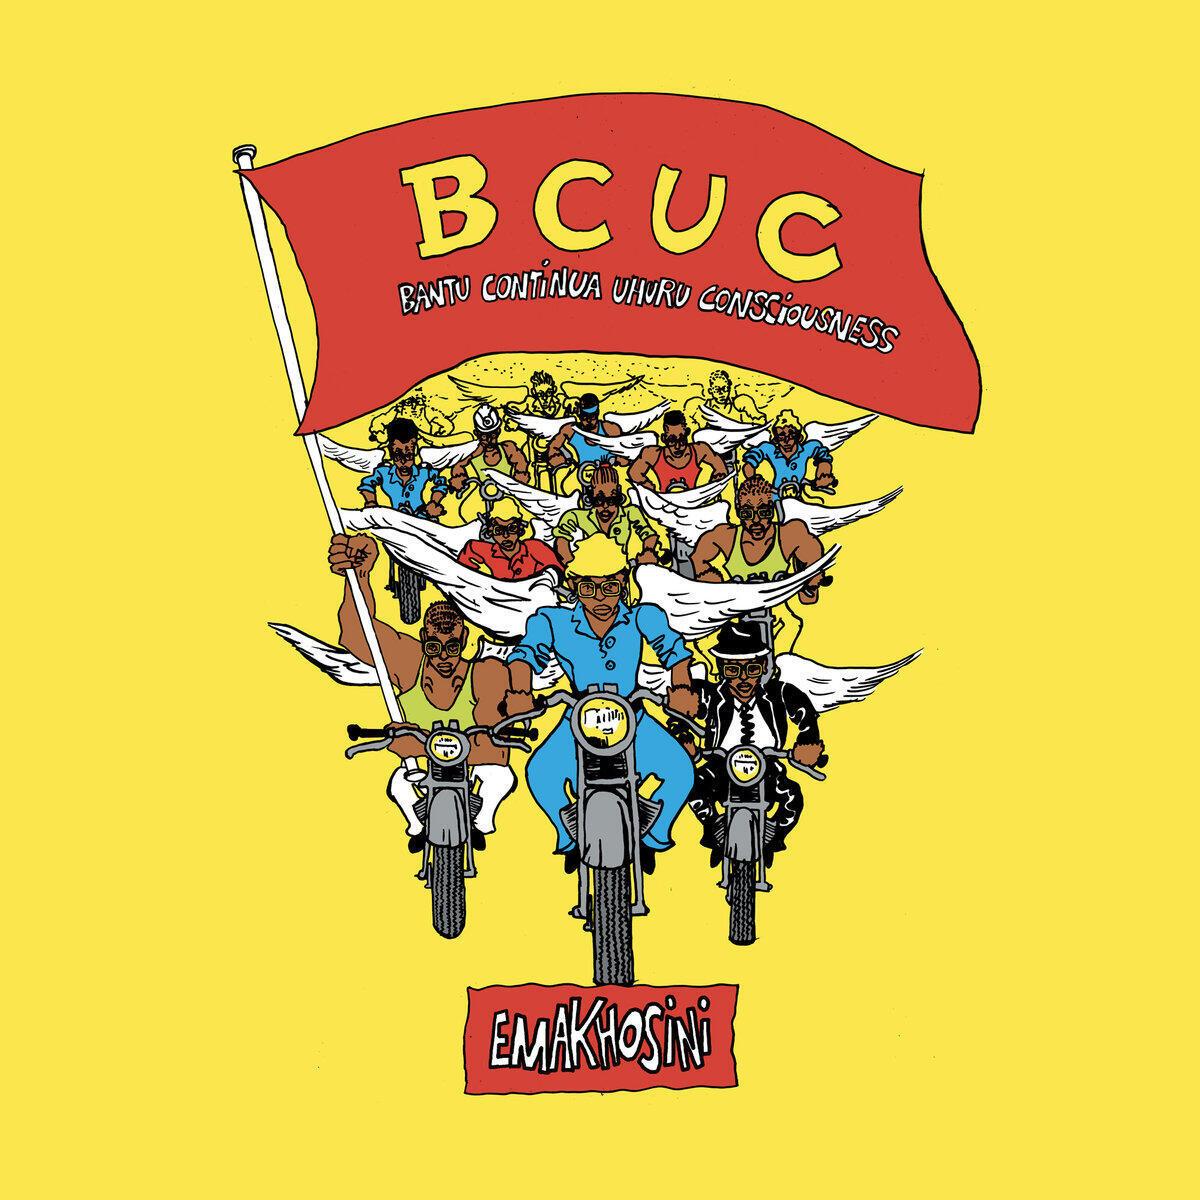 Album cover BCUC by Emakhosini